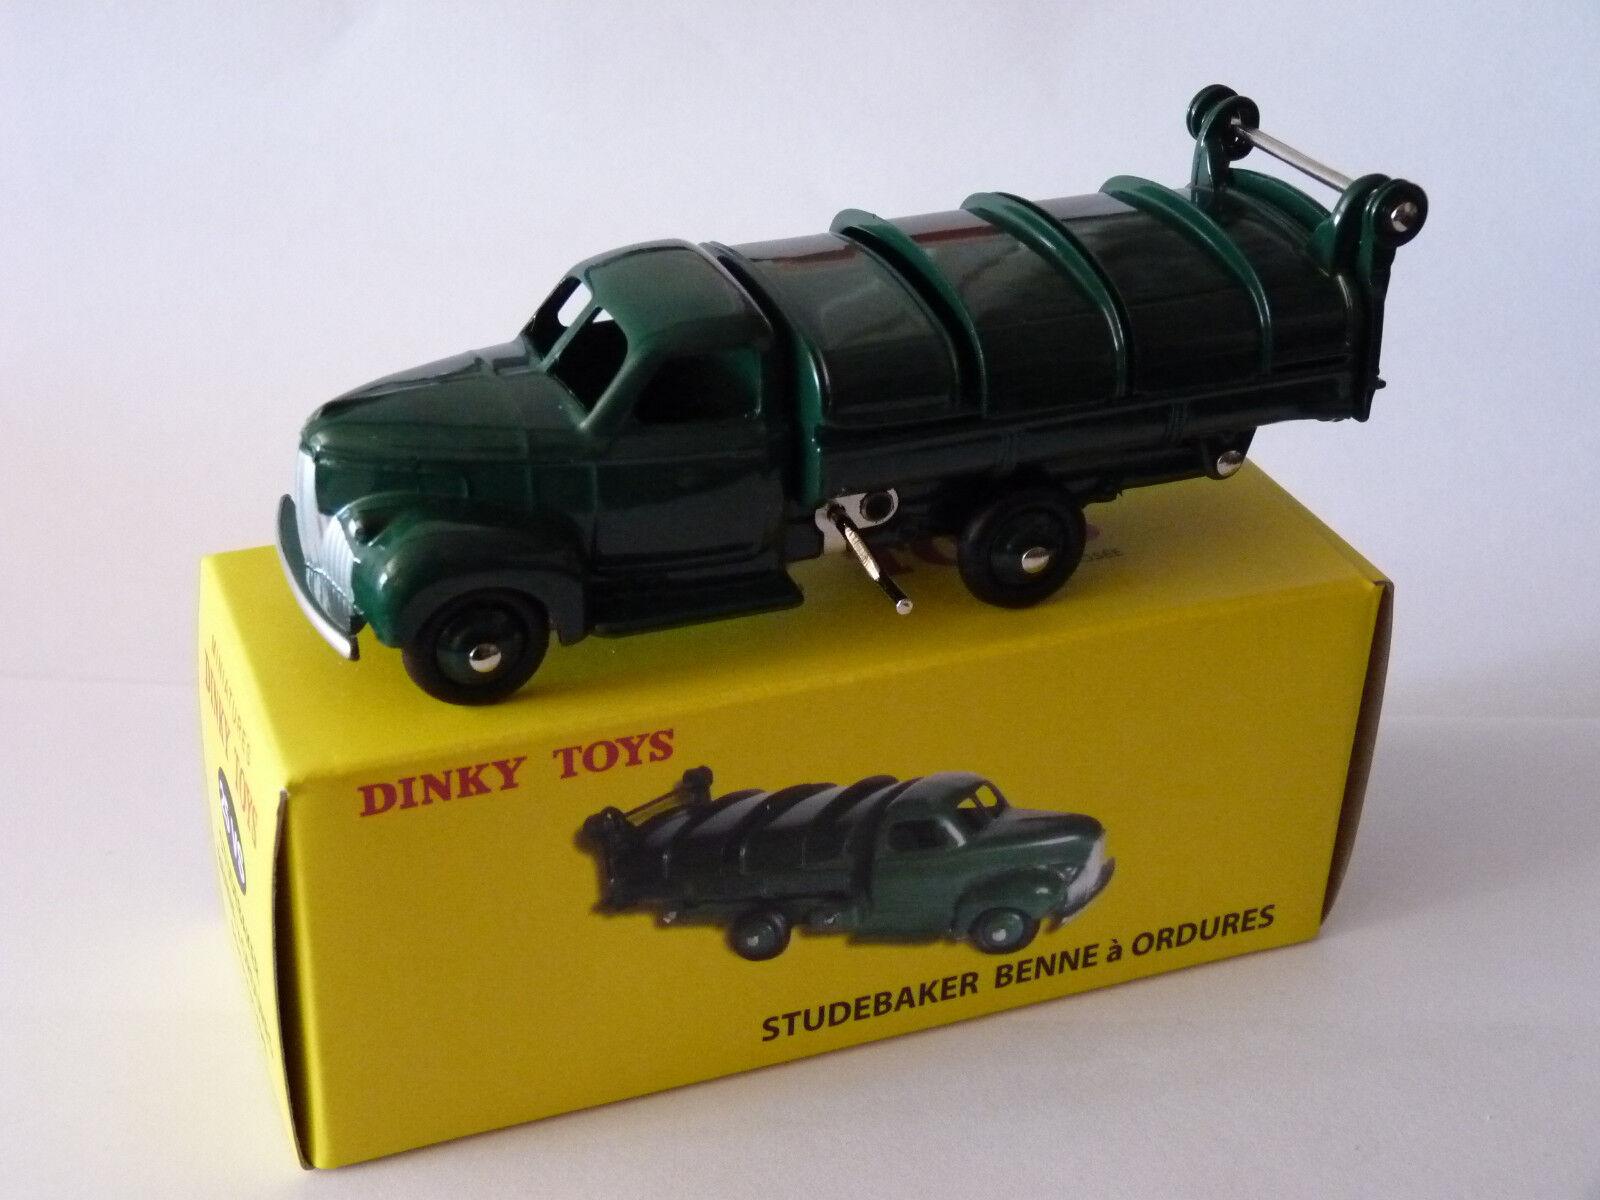 Studebaker Studebaker Studebaker skip to garbage - predotype - ref 25 VS dinky toys atlas 5e4832